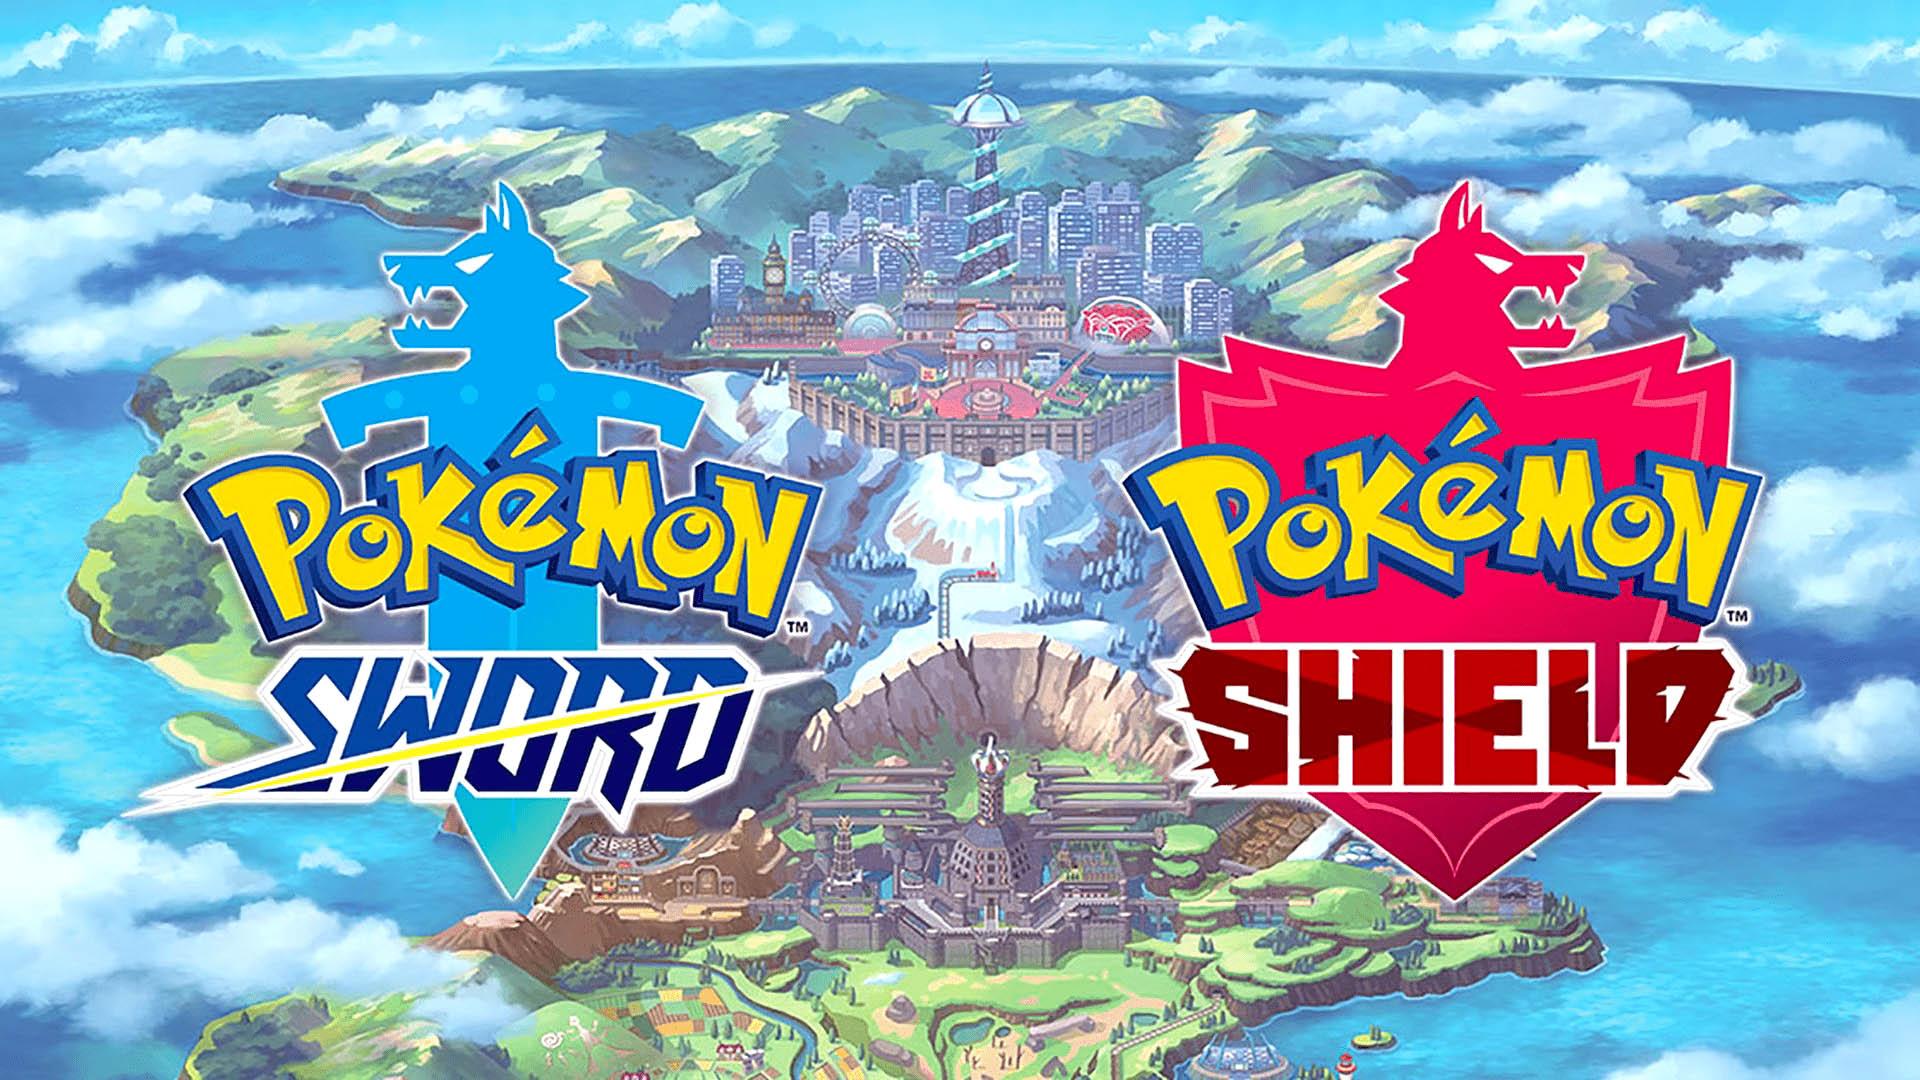 Pokémon Sword Shield Isle of Armor DLC